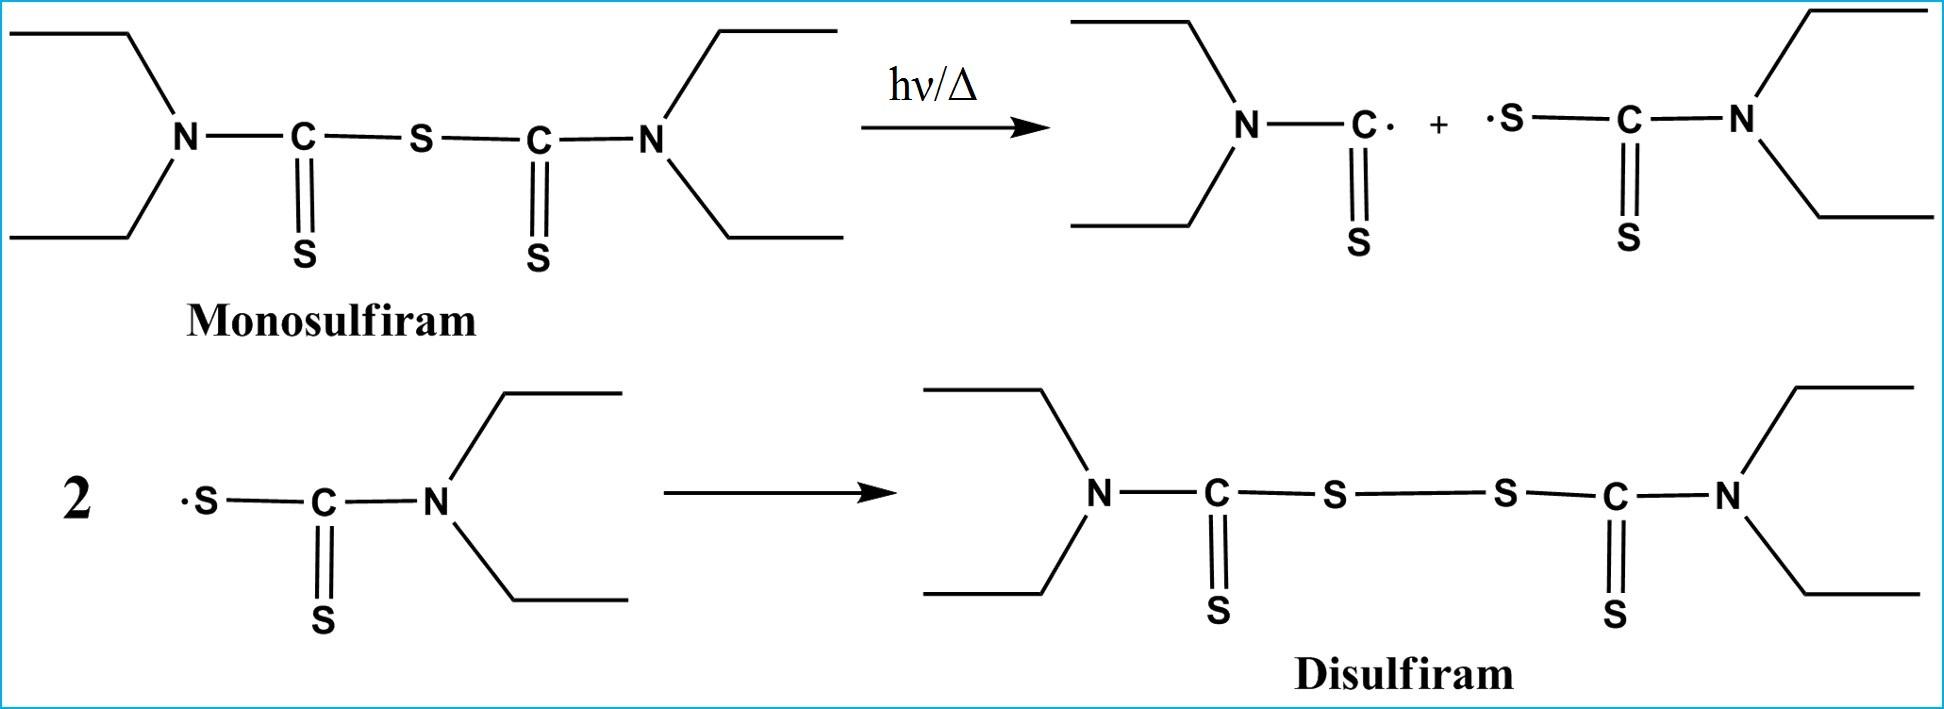 Exploring the Mechanism of Conversion of Monosulfiram into Disulfiram